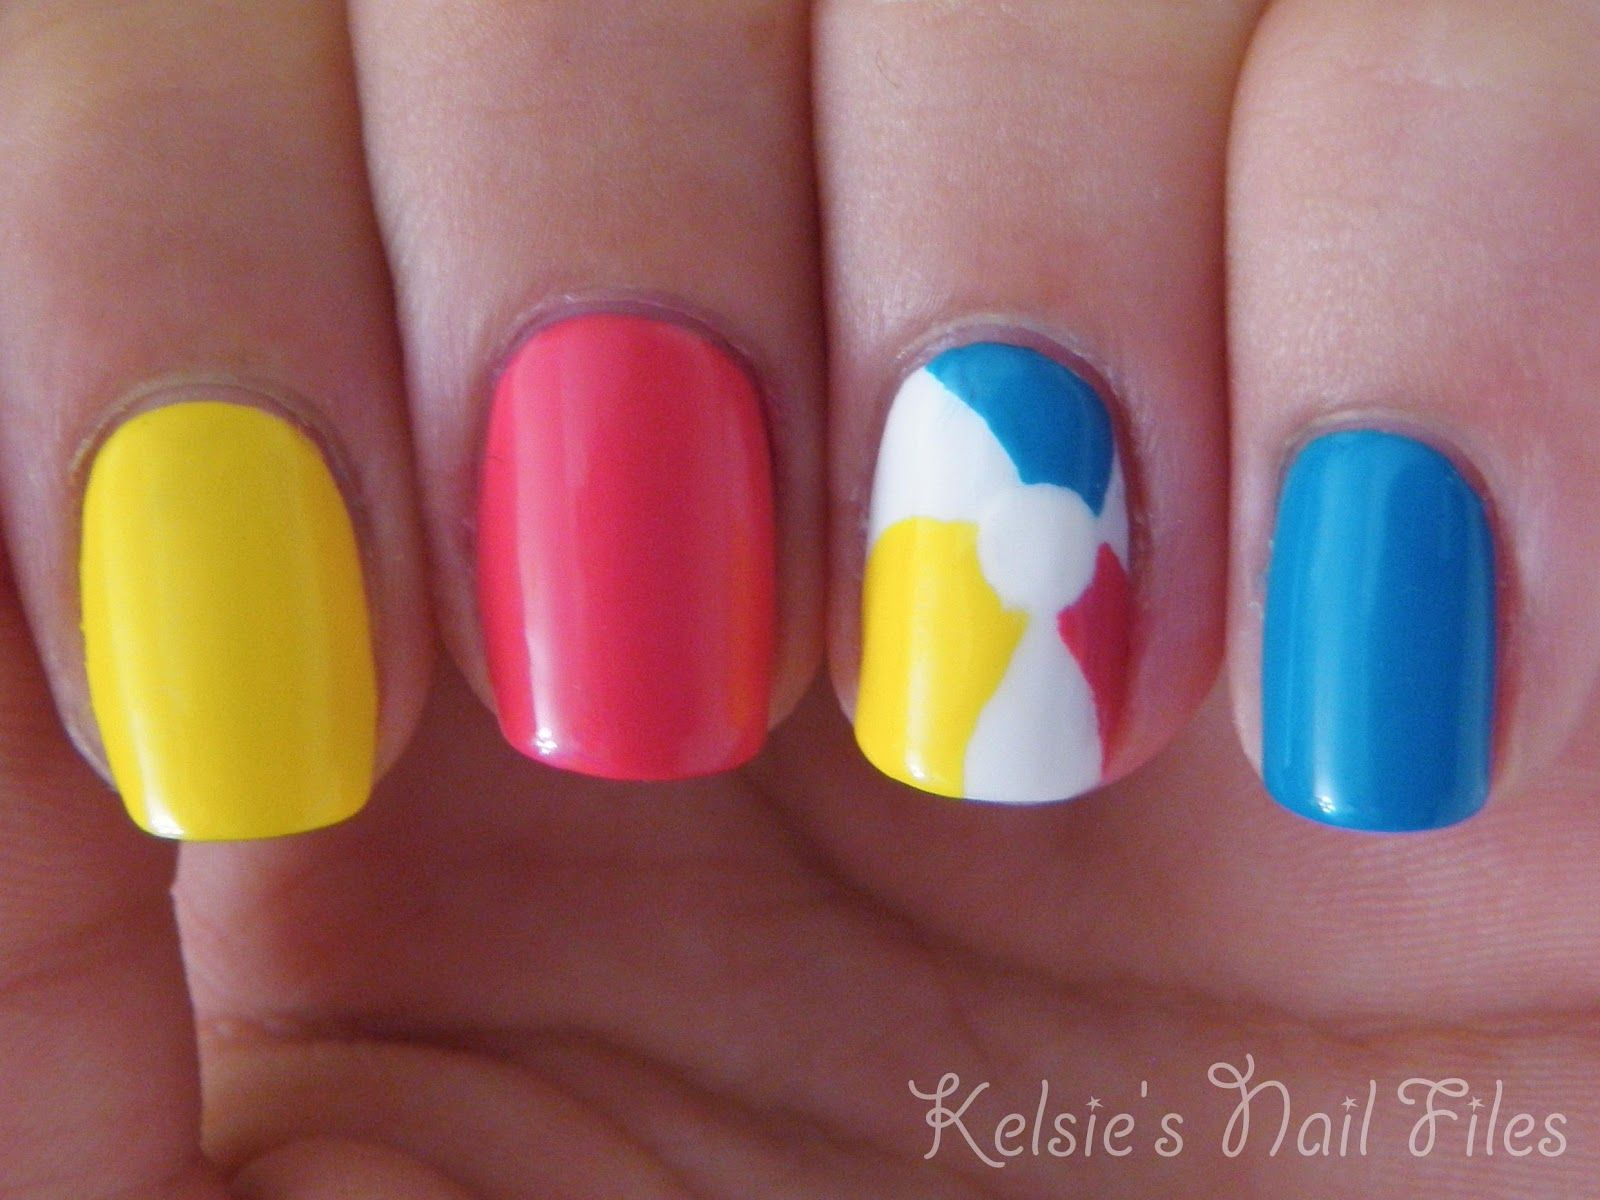 kelsie's nail files candy